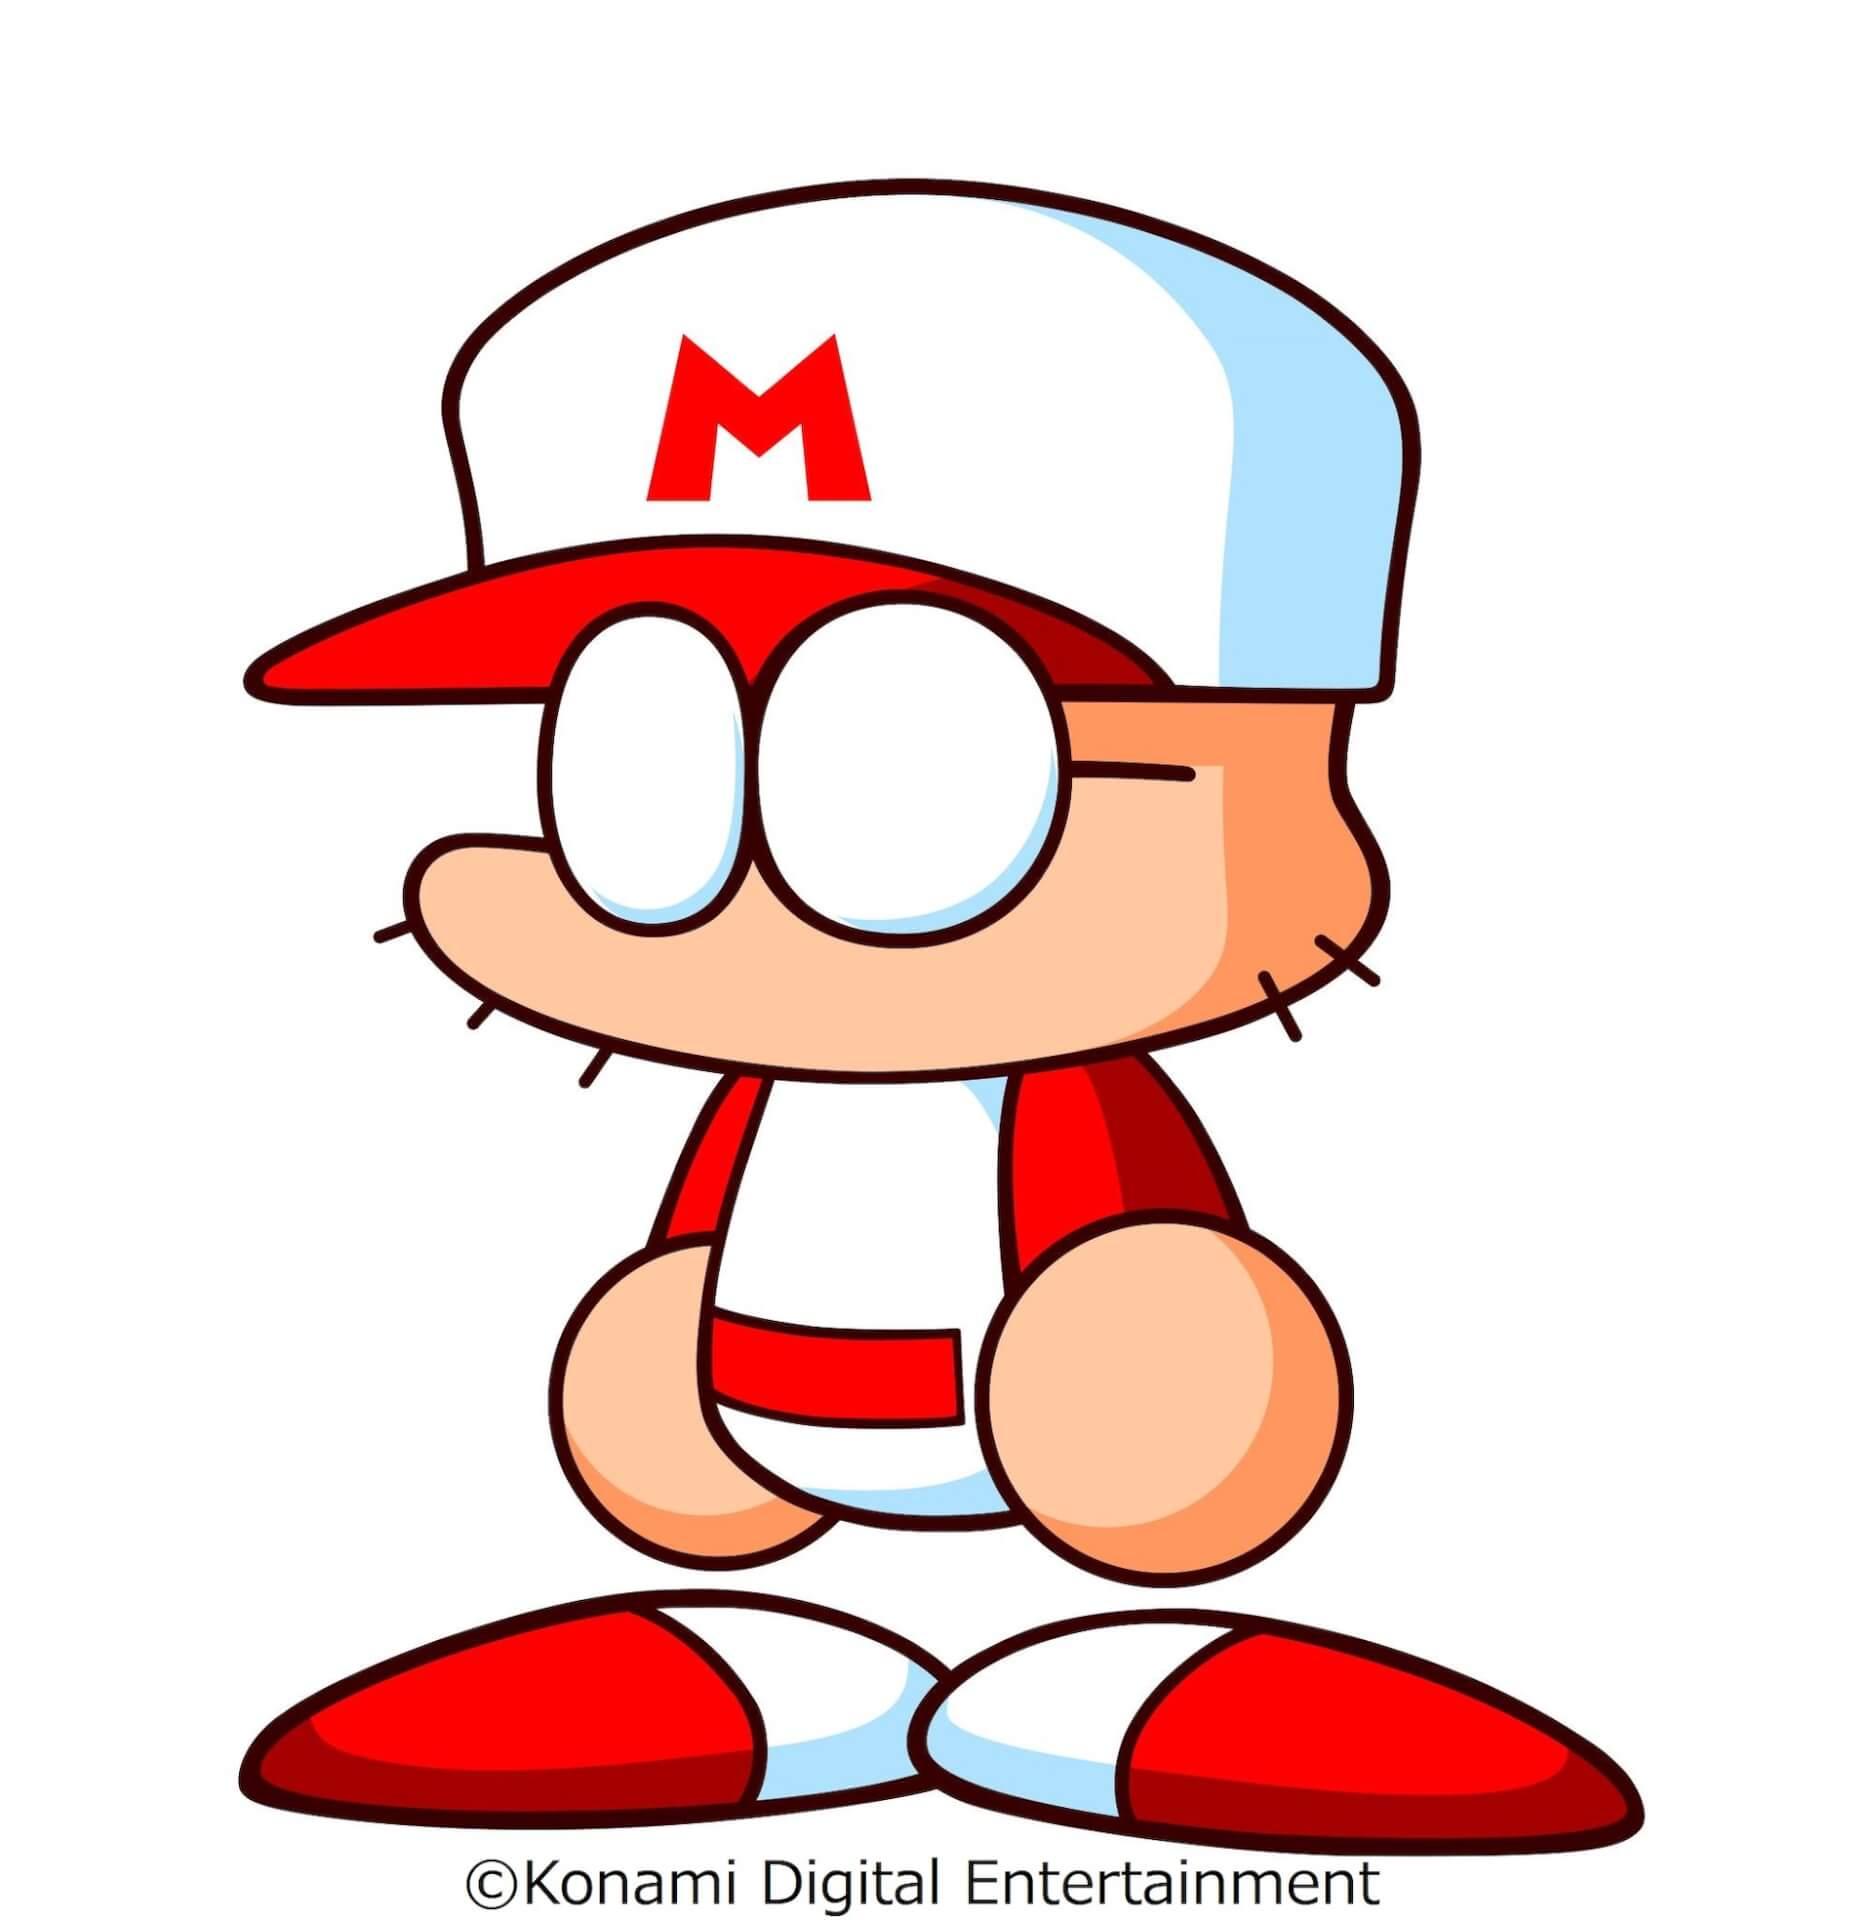 Nintendo Switch『パワプロクンポケットR』の発売日が11月25日に決定!DLCパワポケダッシュも早期購入特典に tech210805_pawapoker_7